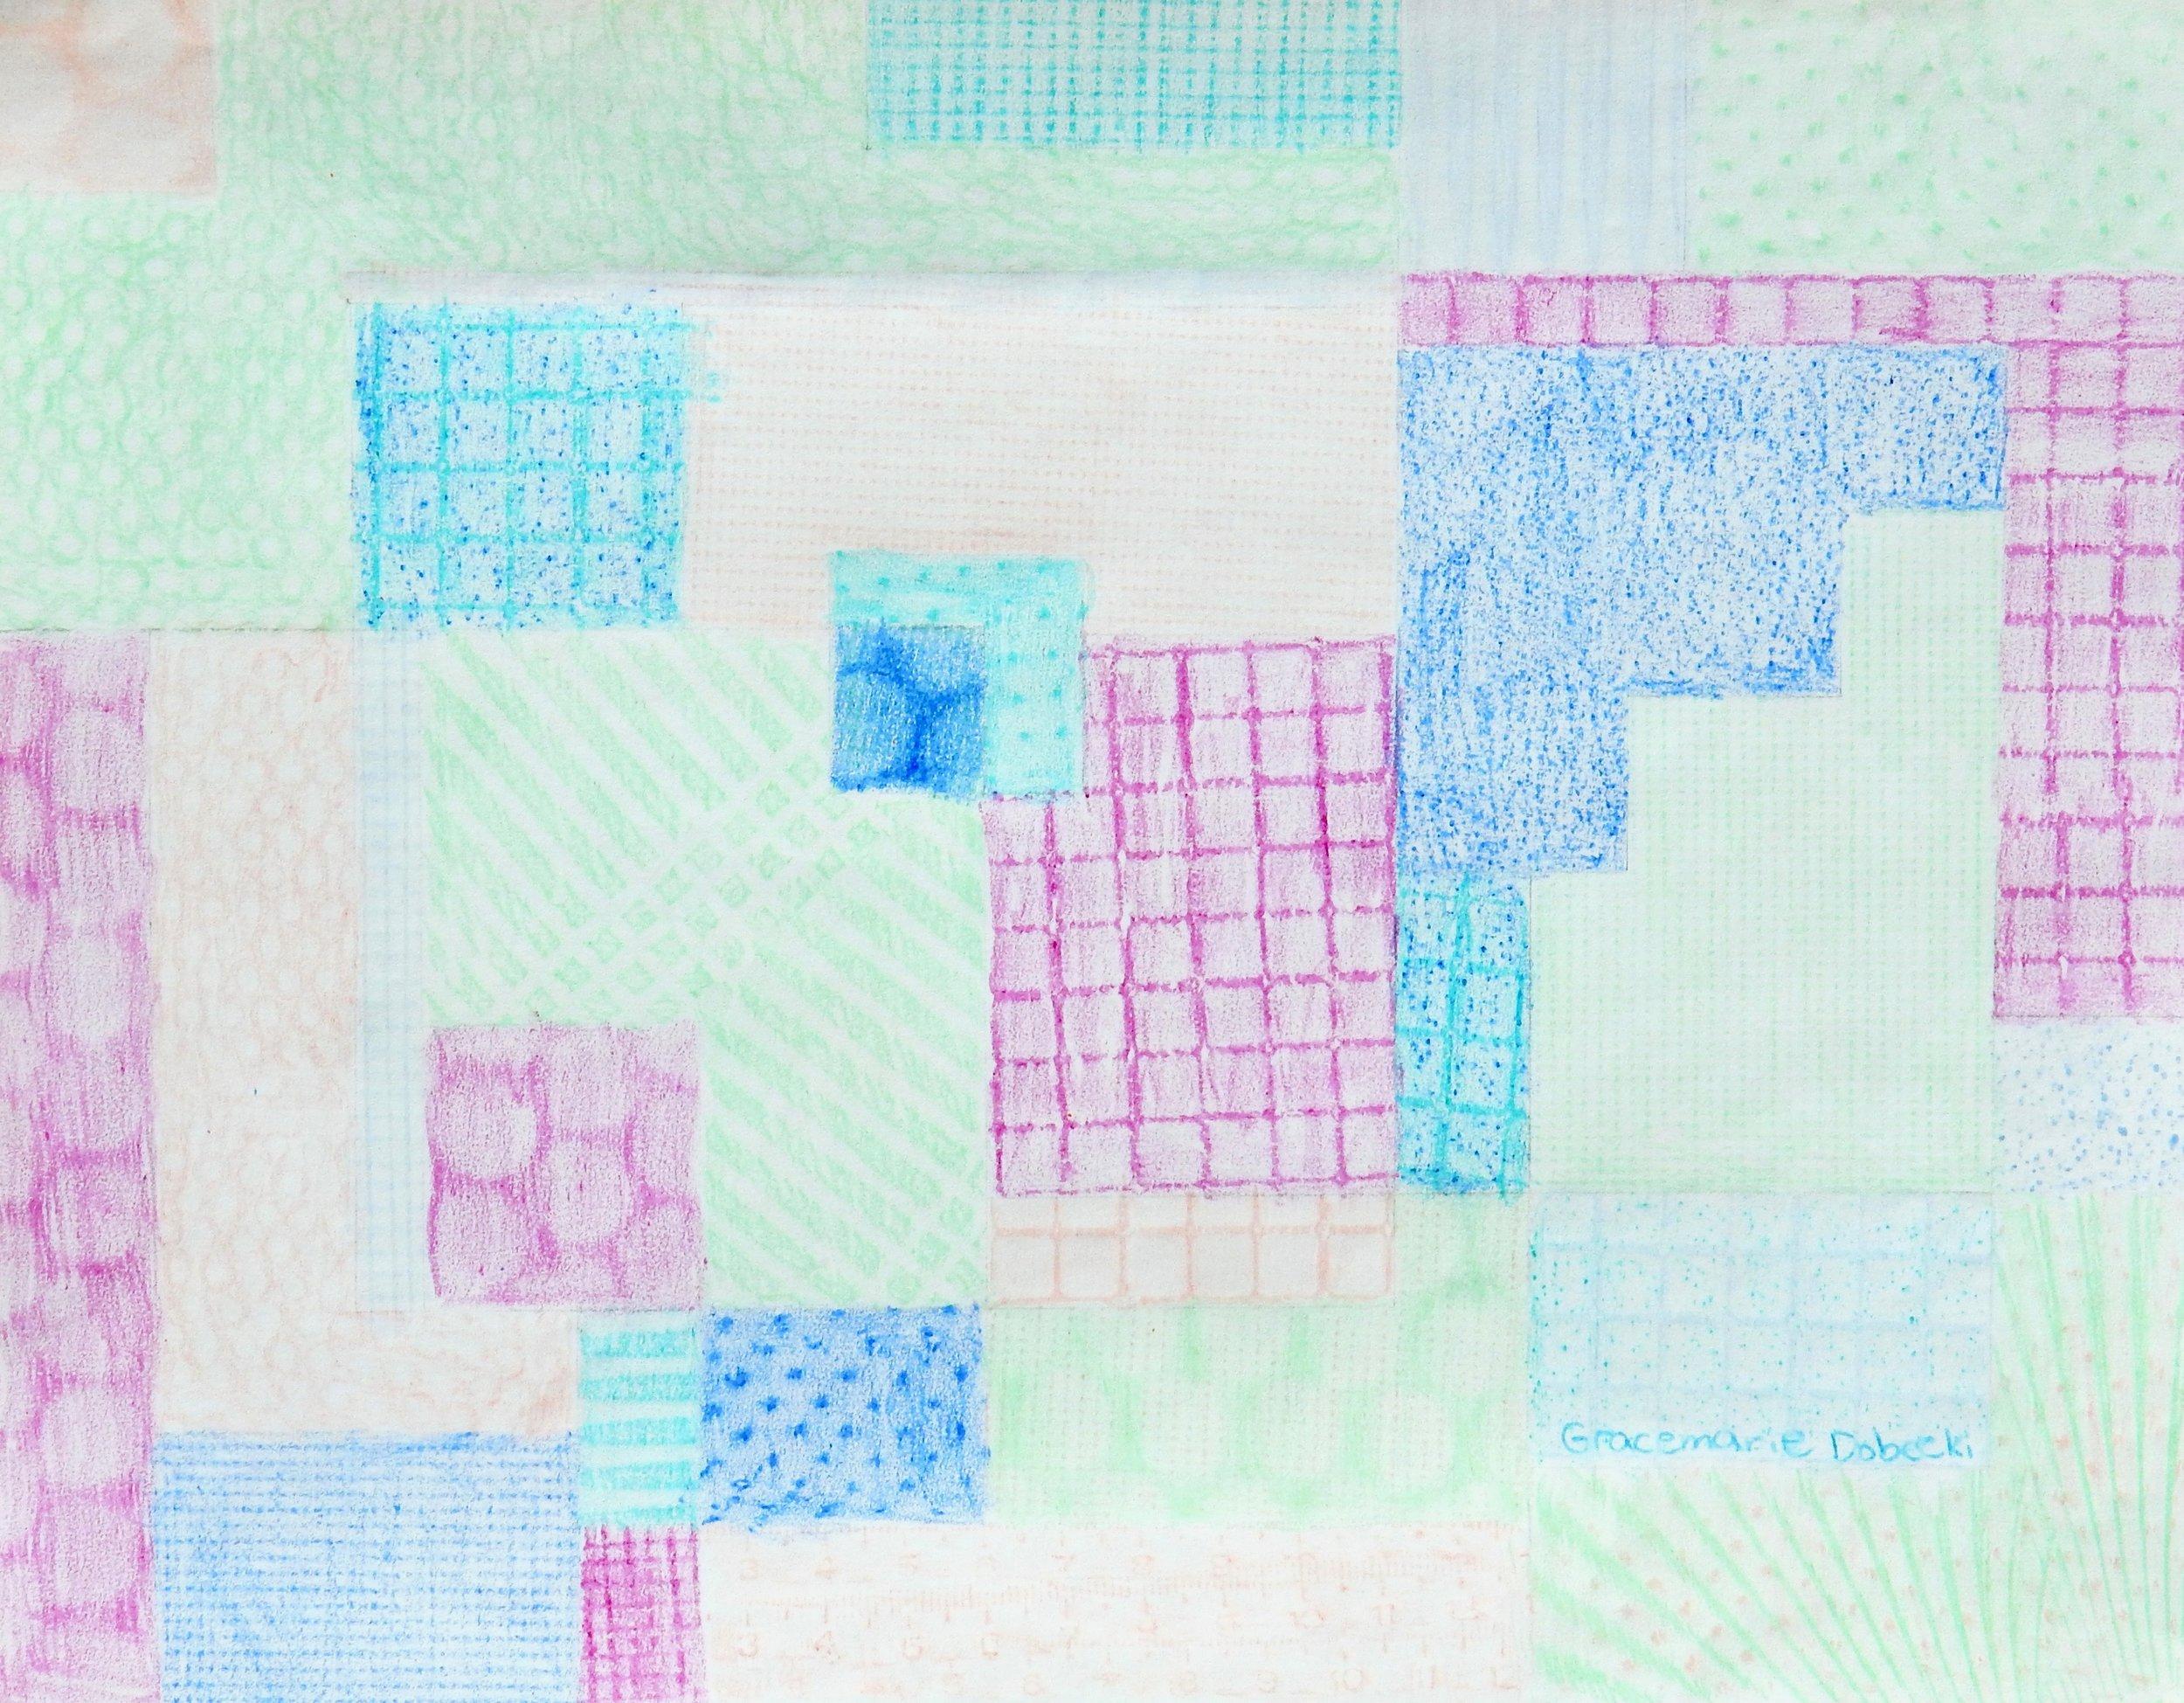 Gracemarie Dobecki.13 yrs.crayons